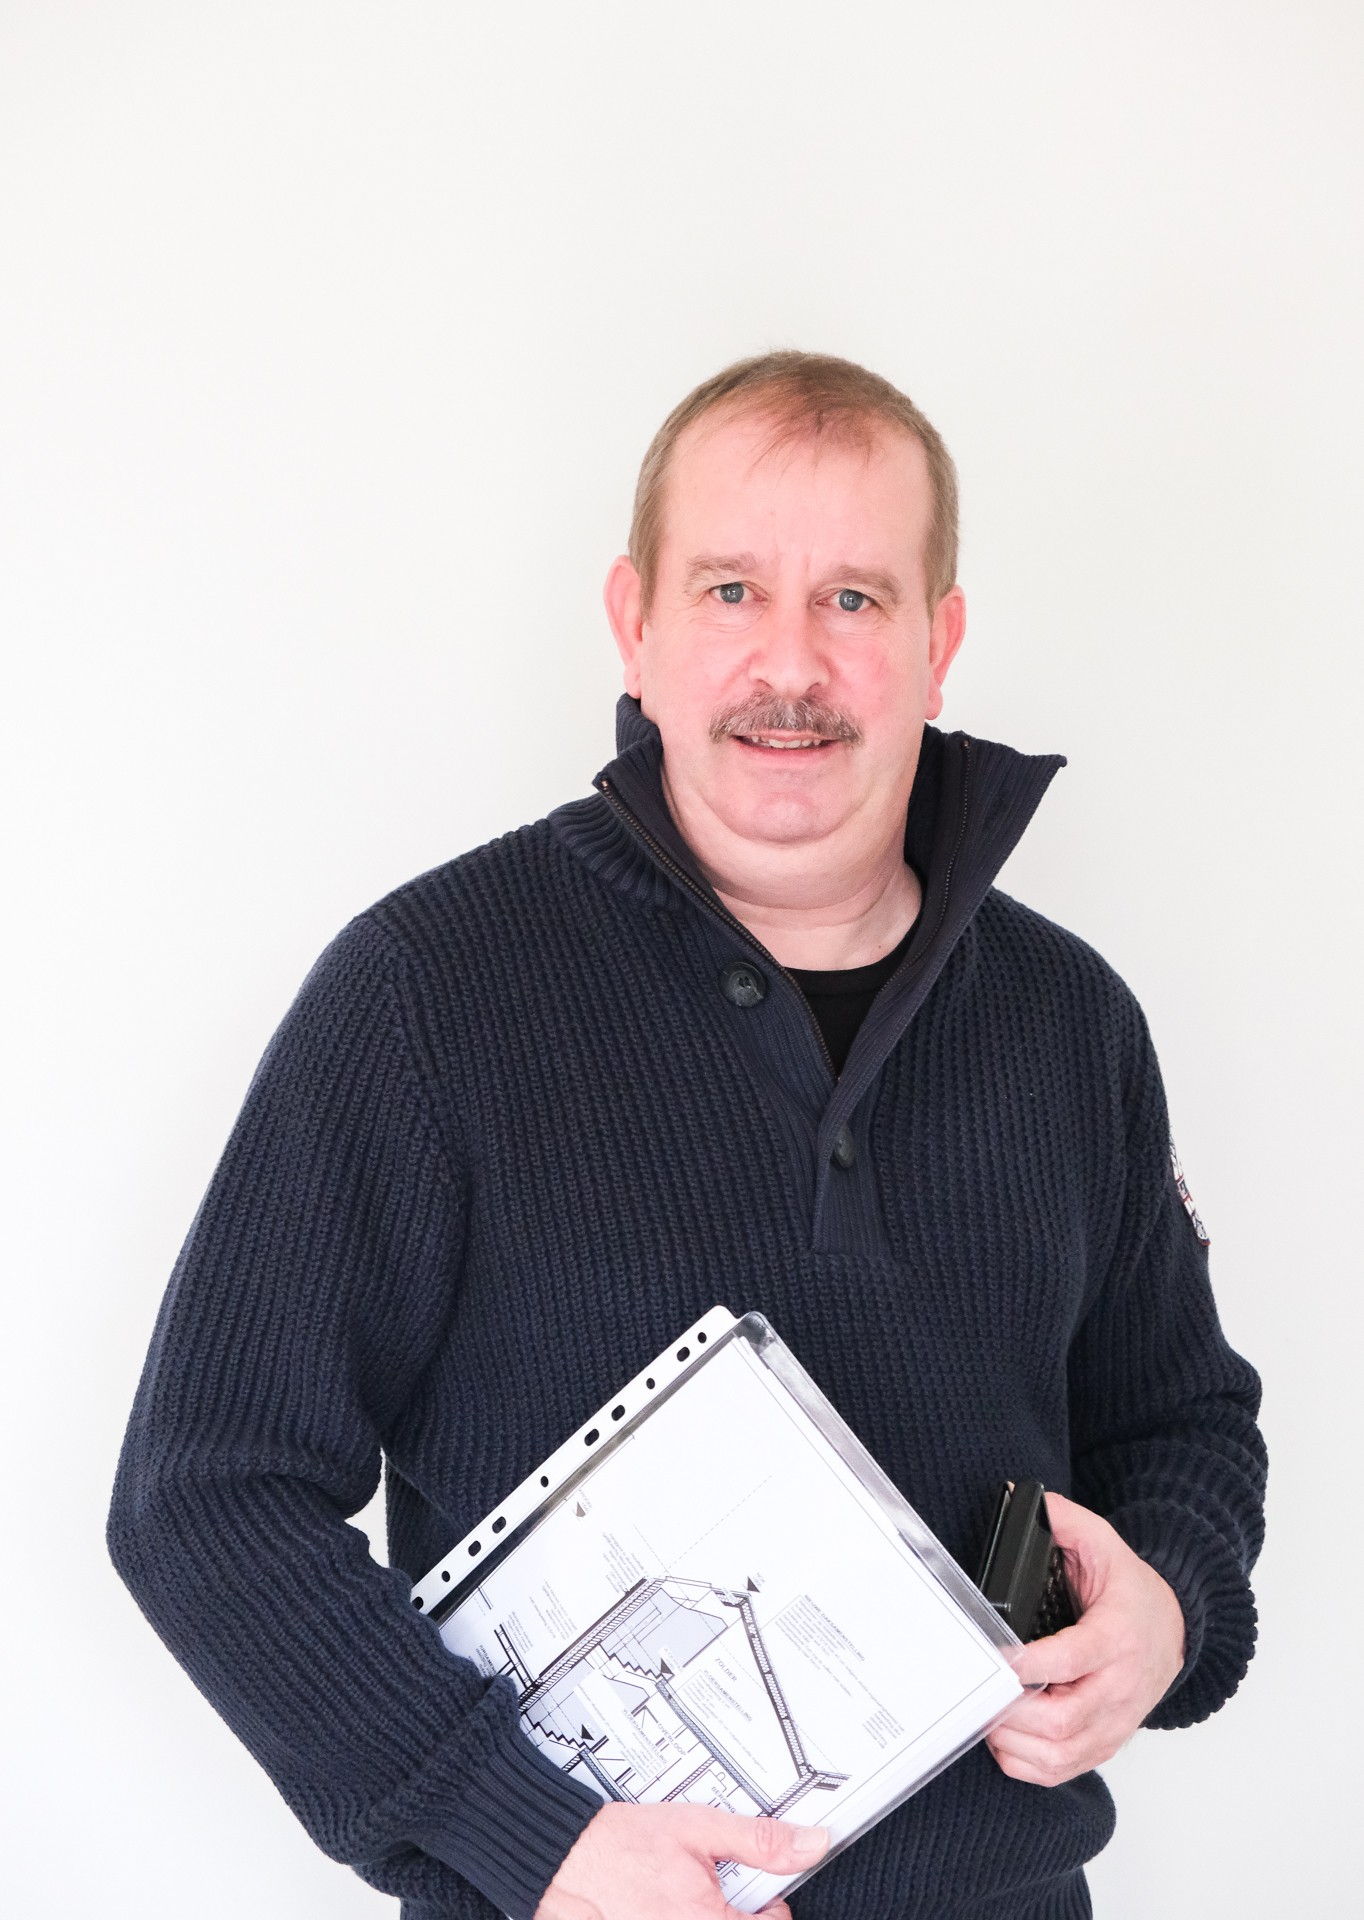 Kurt Dielman